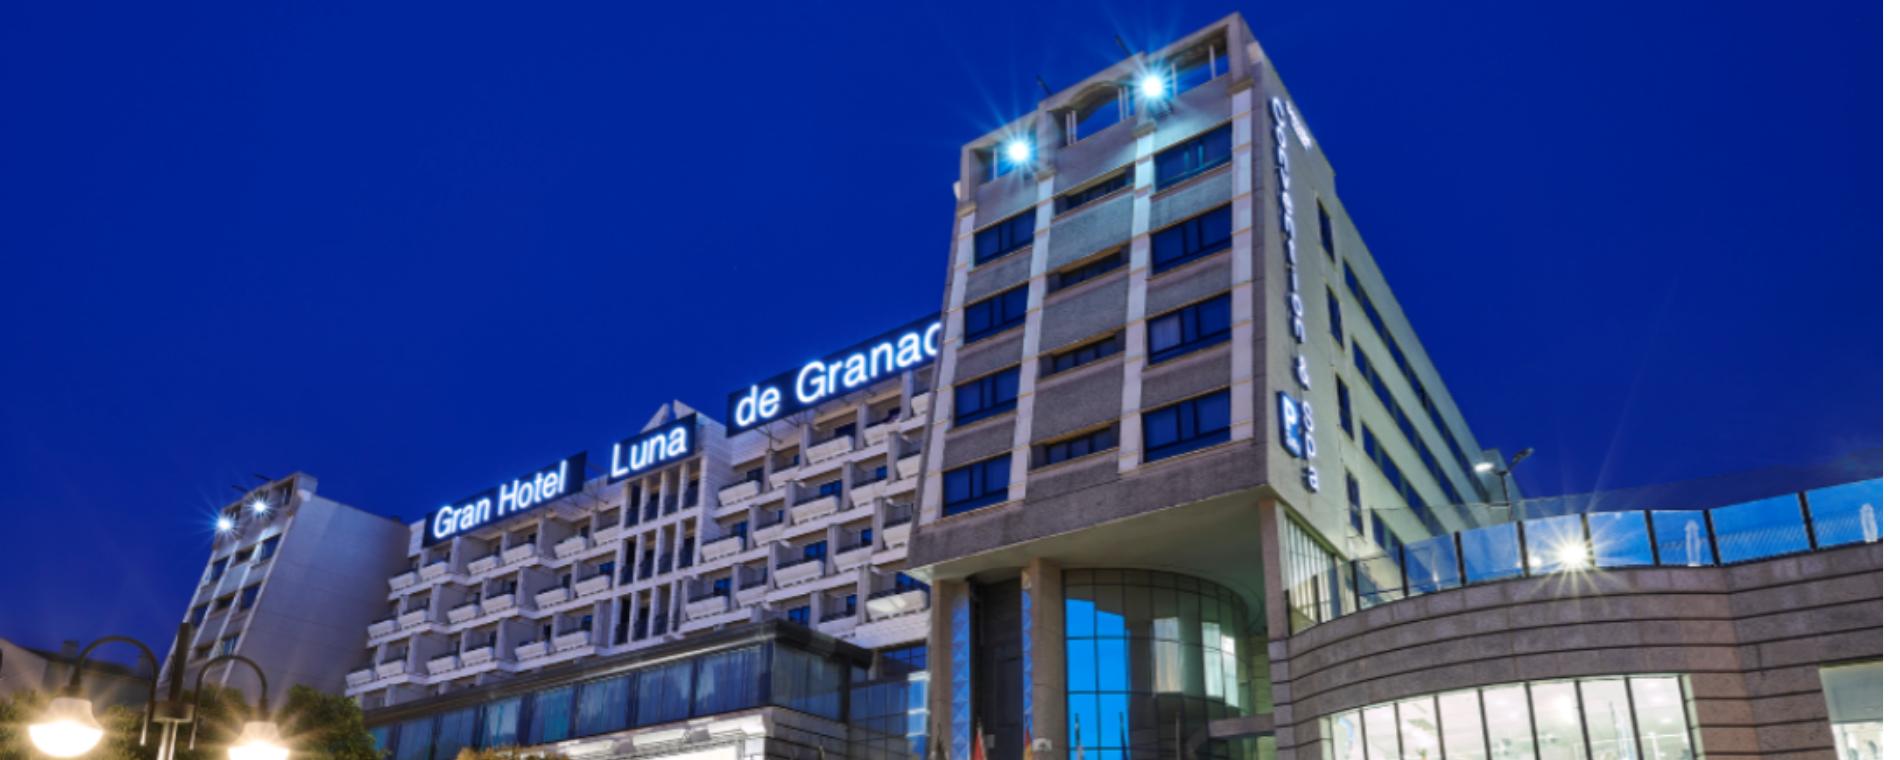 Hotel corporativa deLunagroup